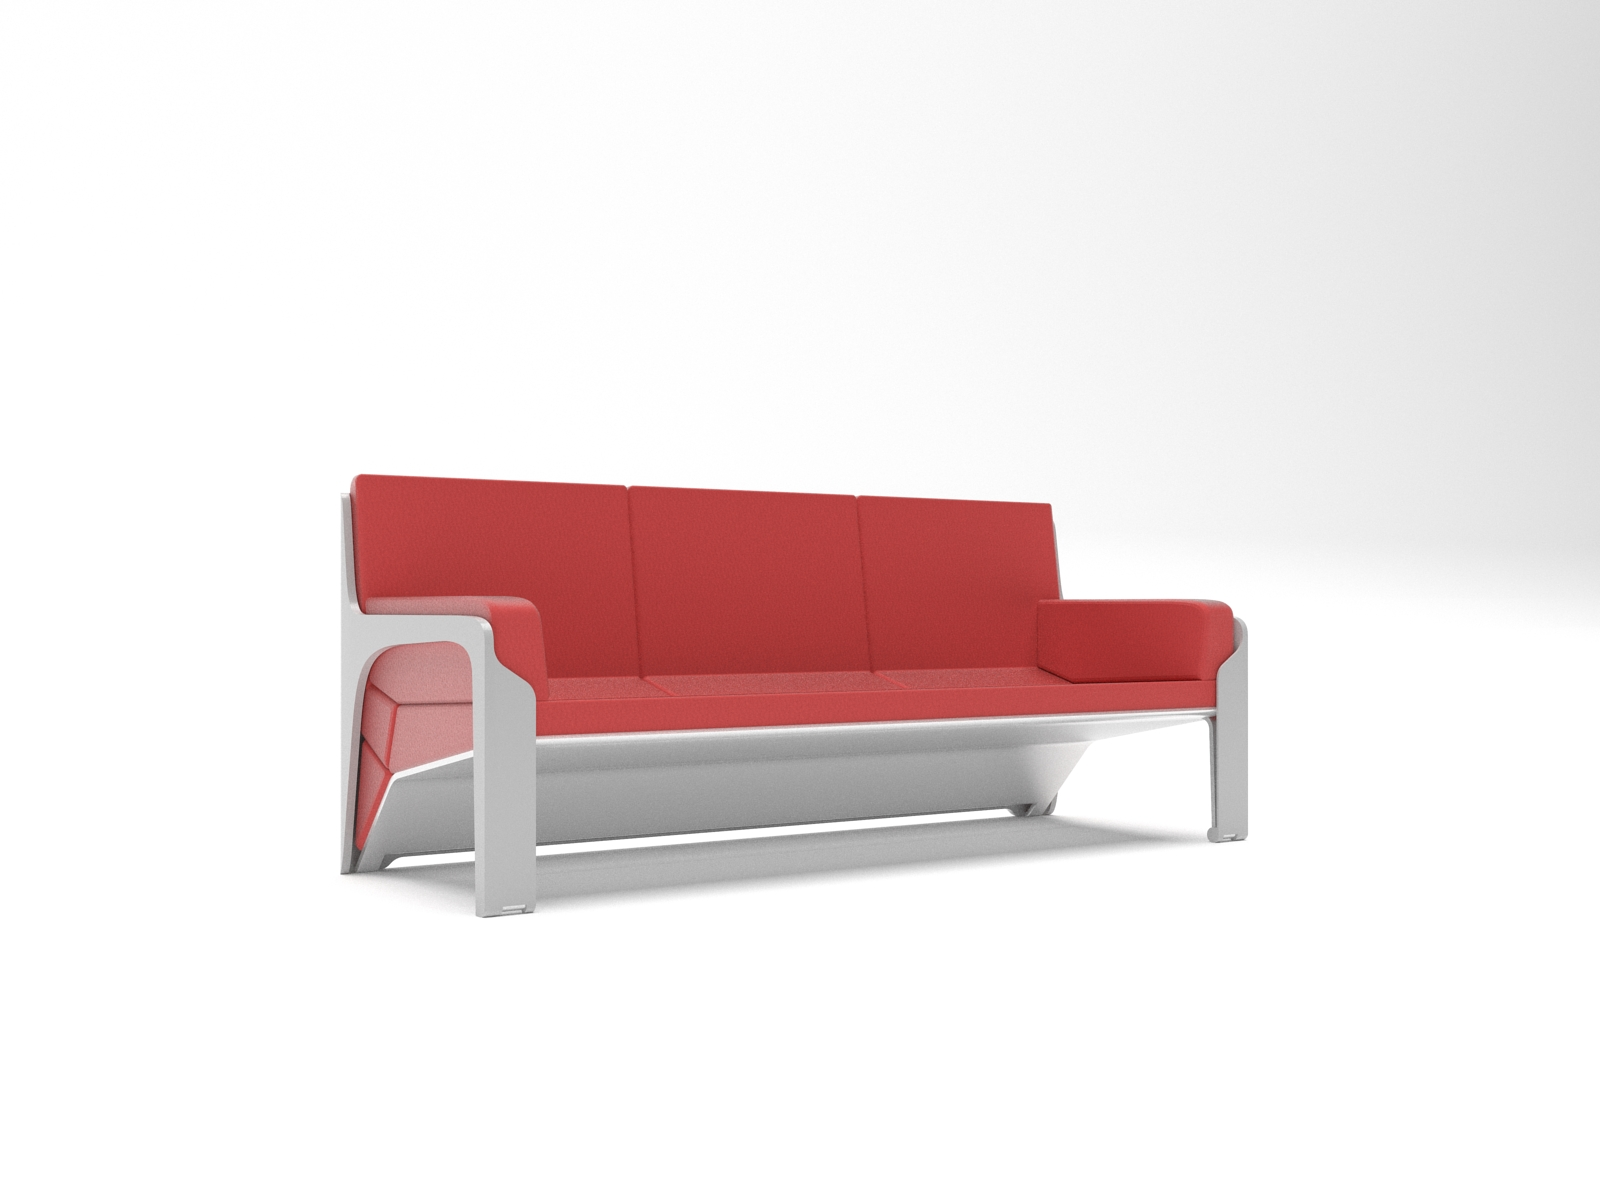 LIVDIN Sofa